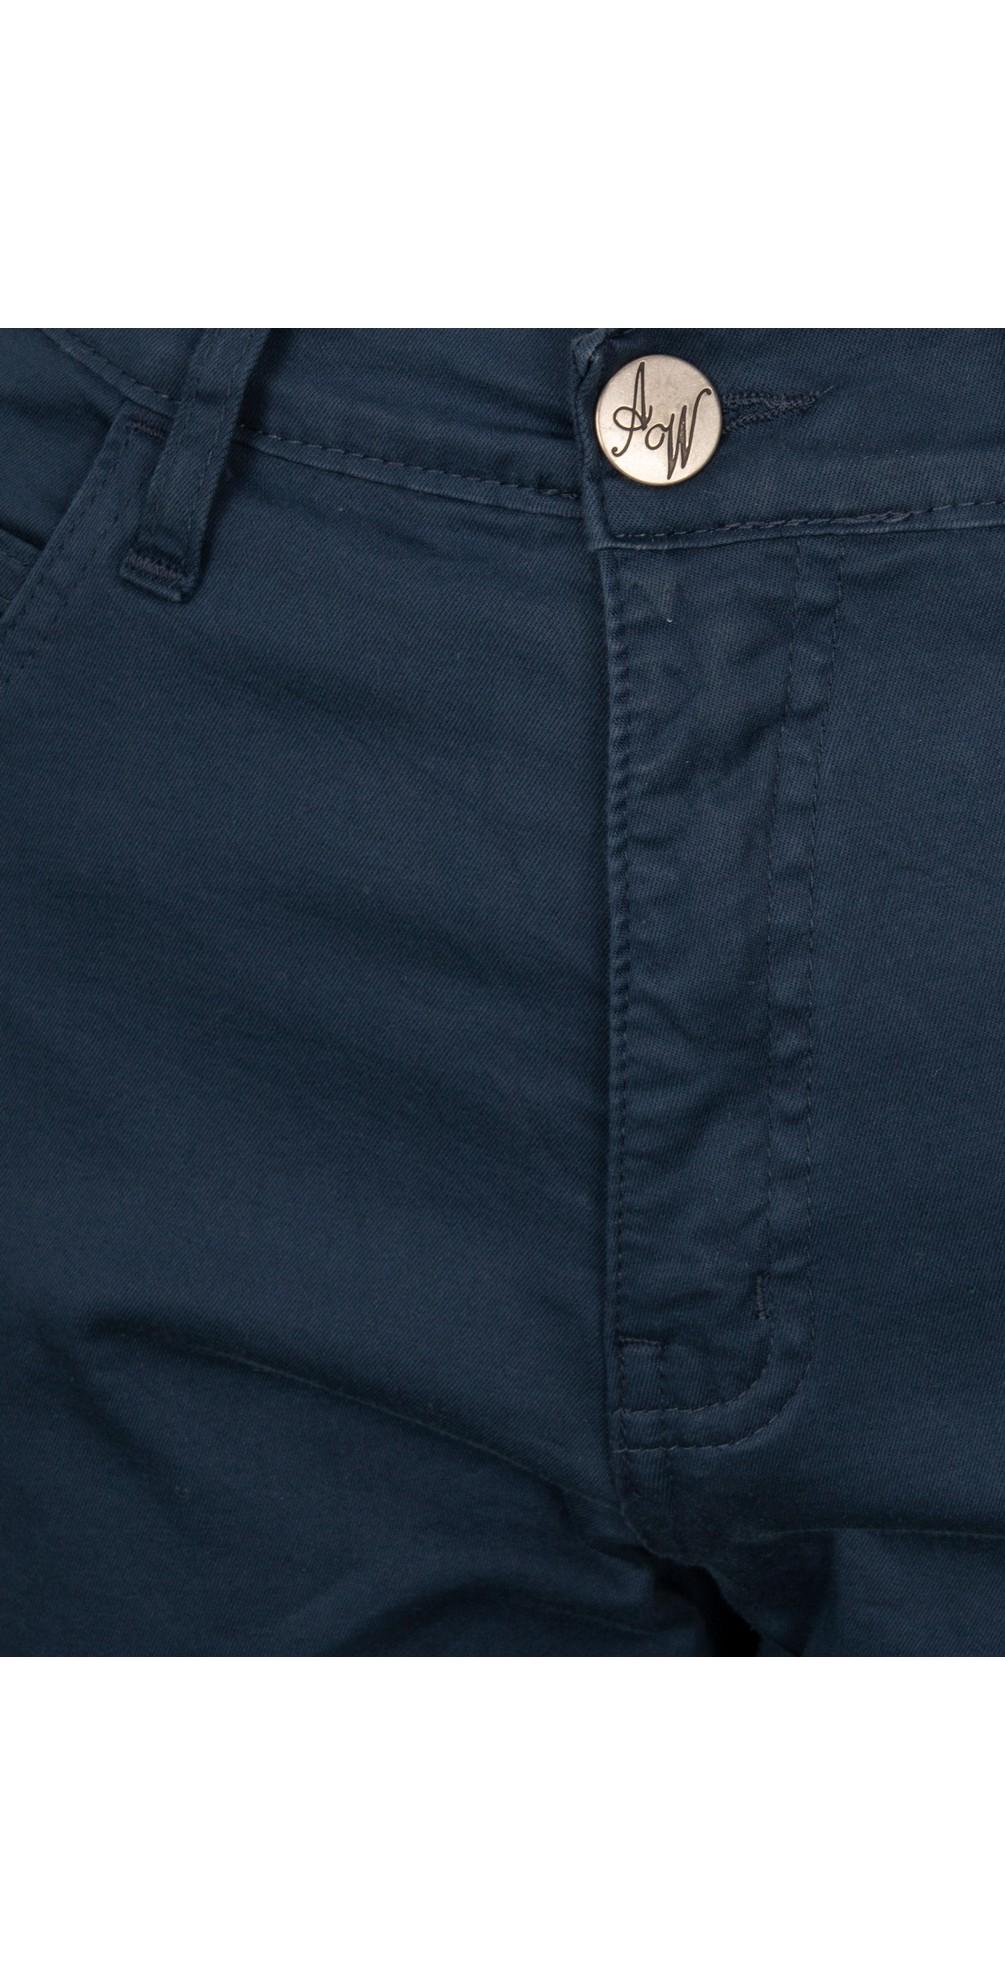 Moonlite 09 Superstretch Slimfit Crop Trouser main image